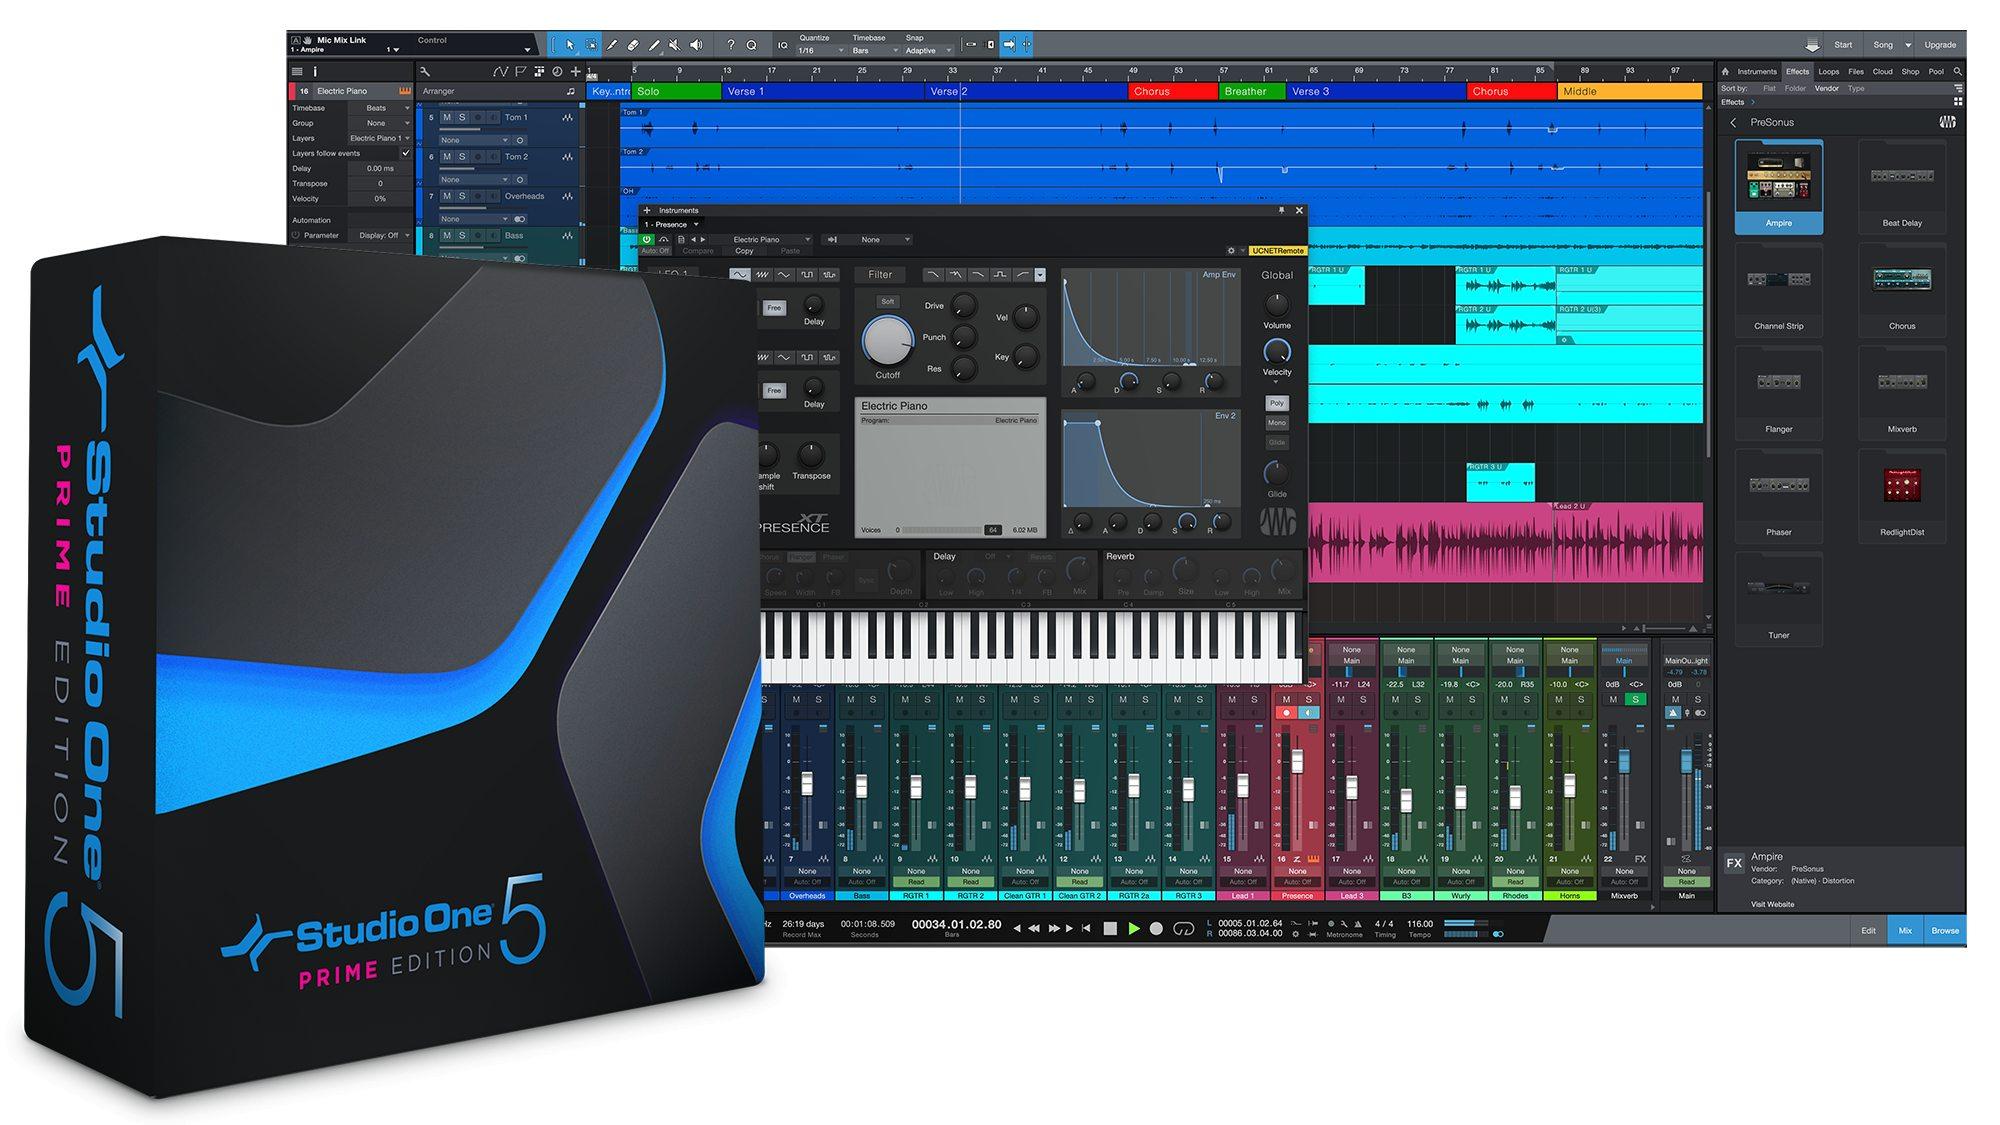 Studio One 5 Prime | PreSonus Shop